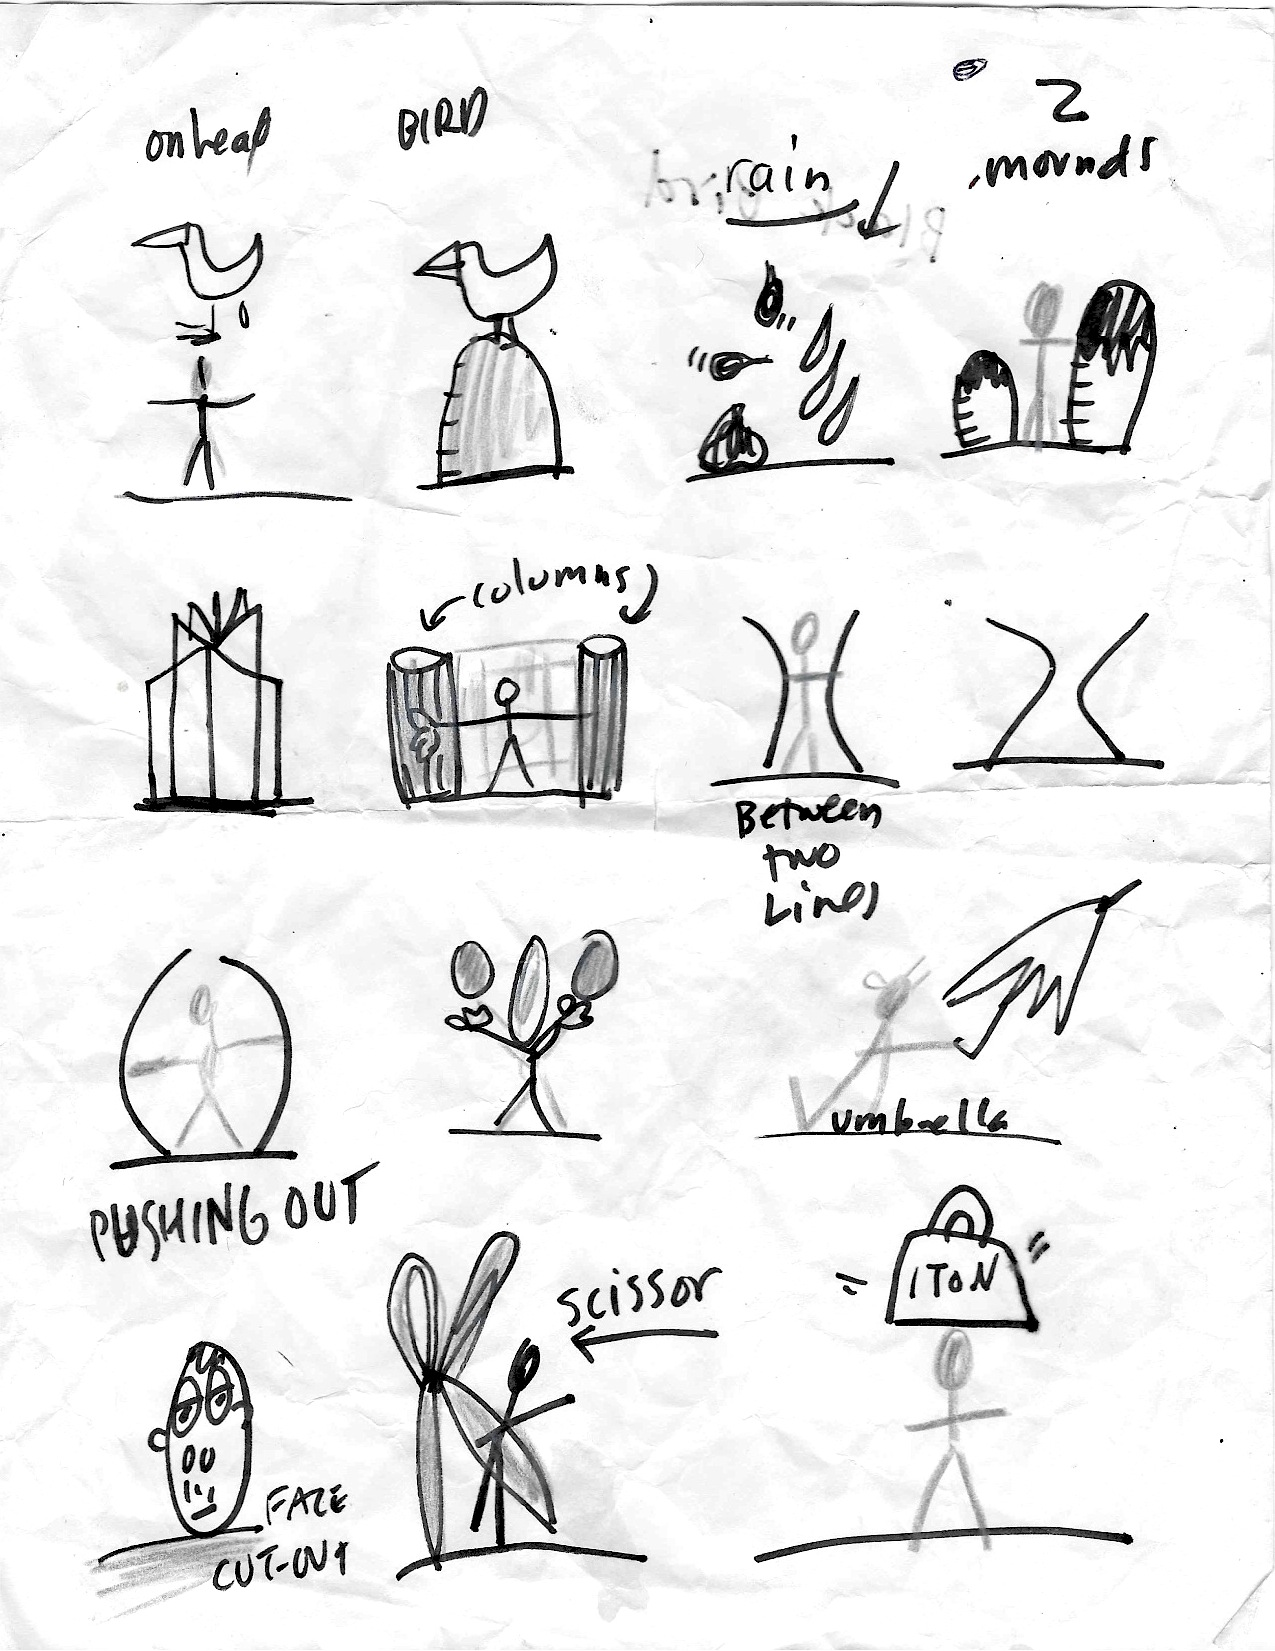 flatbush sketch ups.jpg